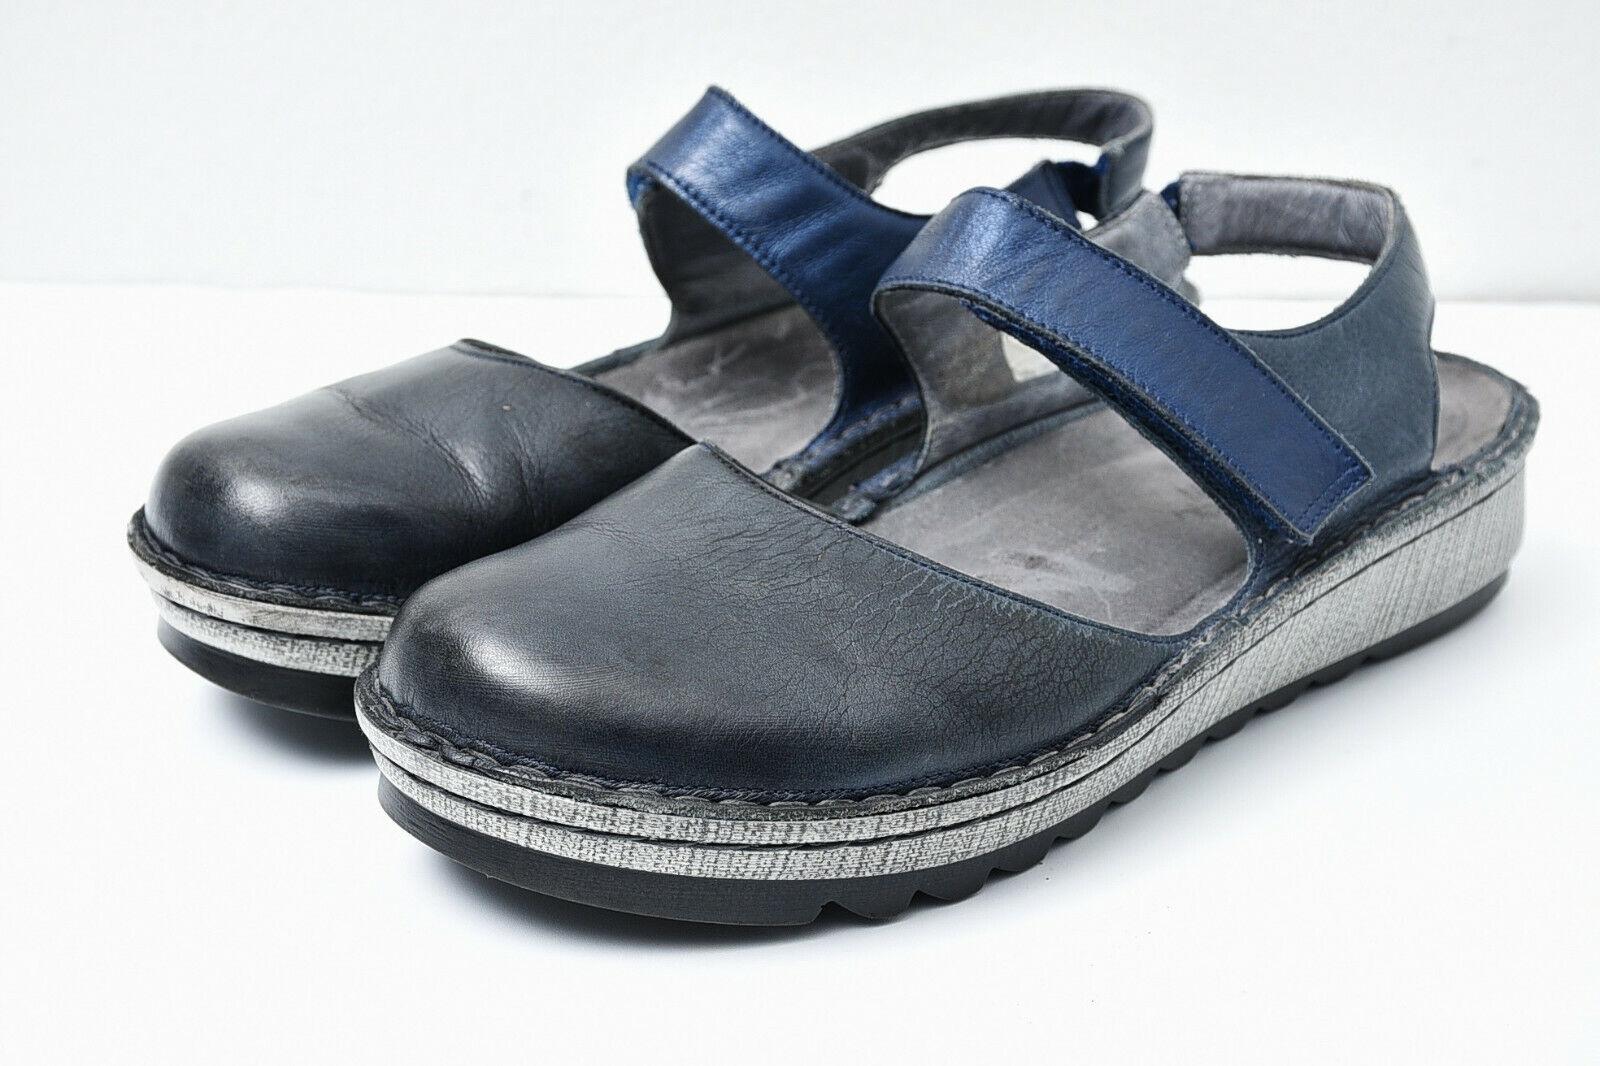 Naot Womens Comfort Leather Maryjane Slingback Shoes Sz 39